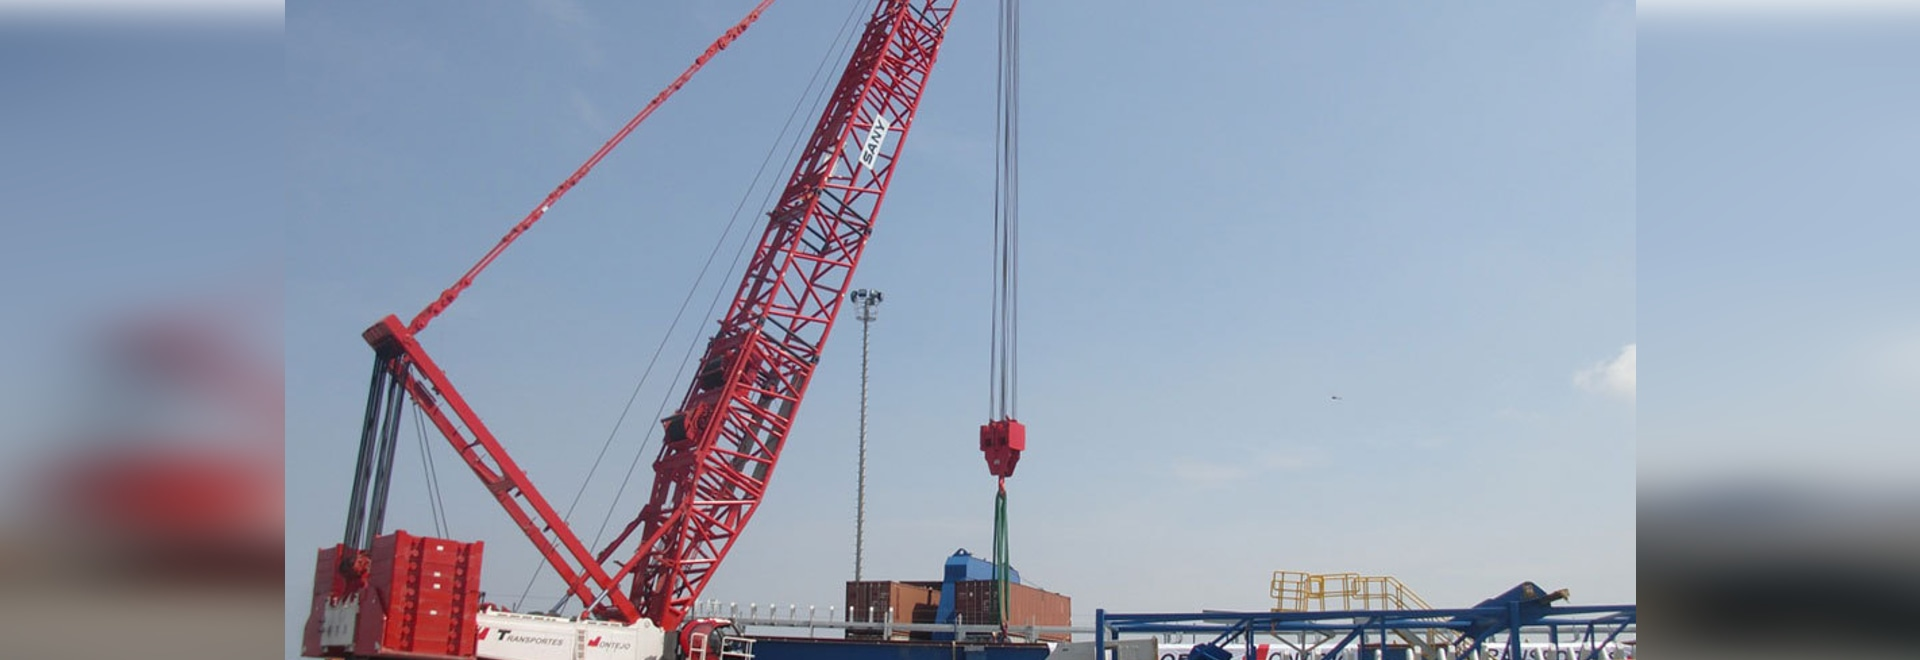 SANY SCC7500 crawler crane at the port of Mamonal, Cartagena